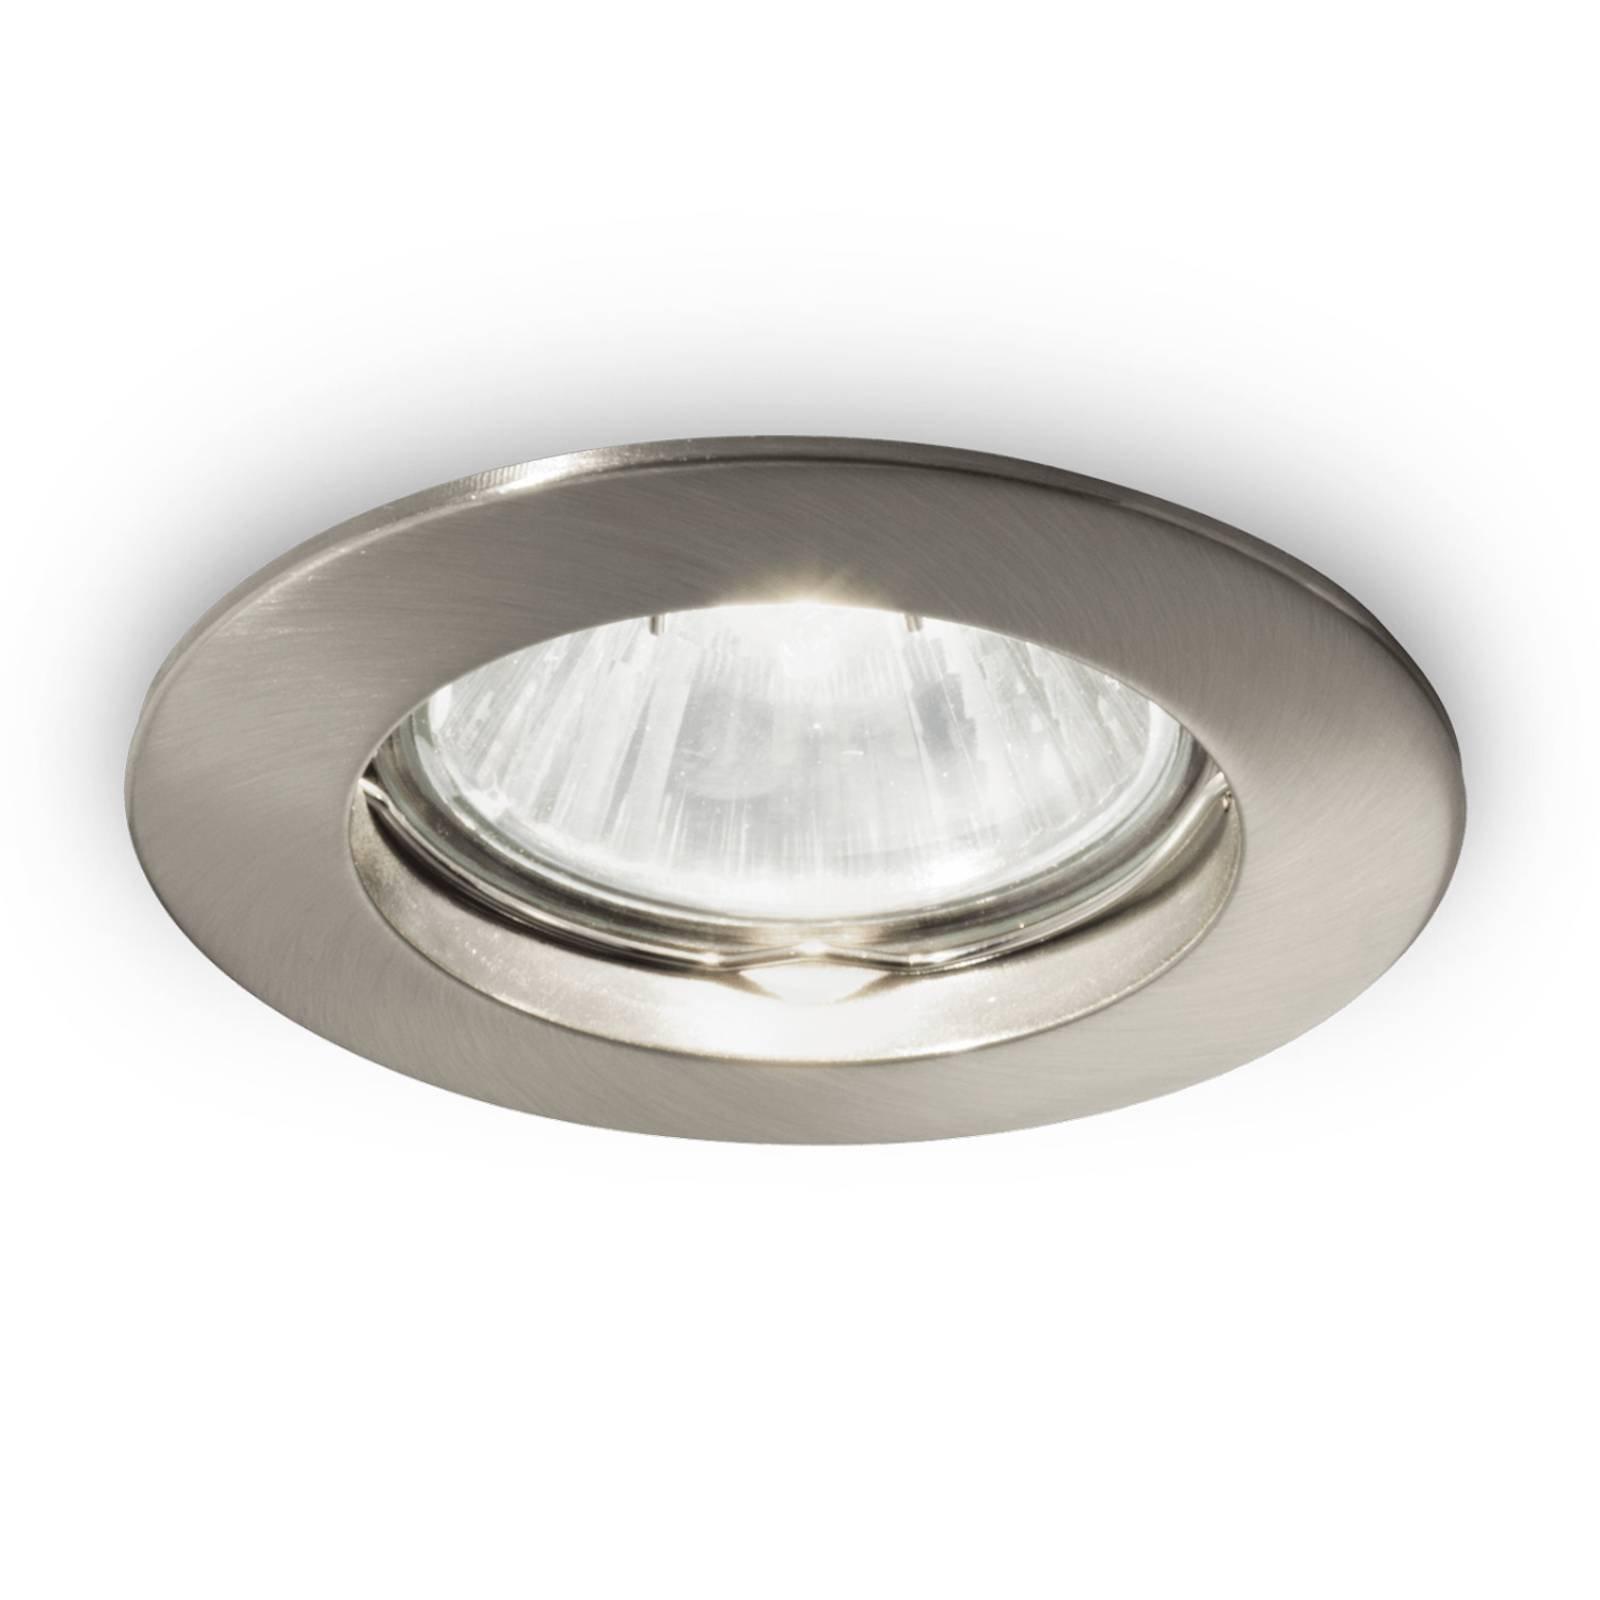 Innebygget taklampe Jazz, rund GU10 3 stykk nikkel